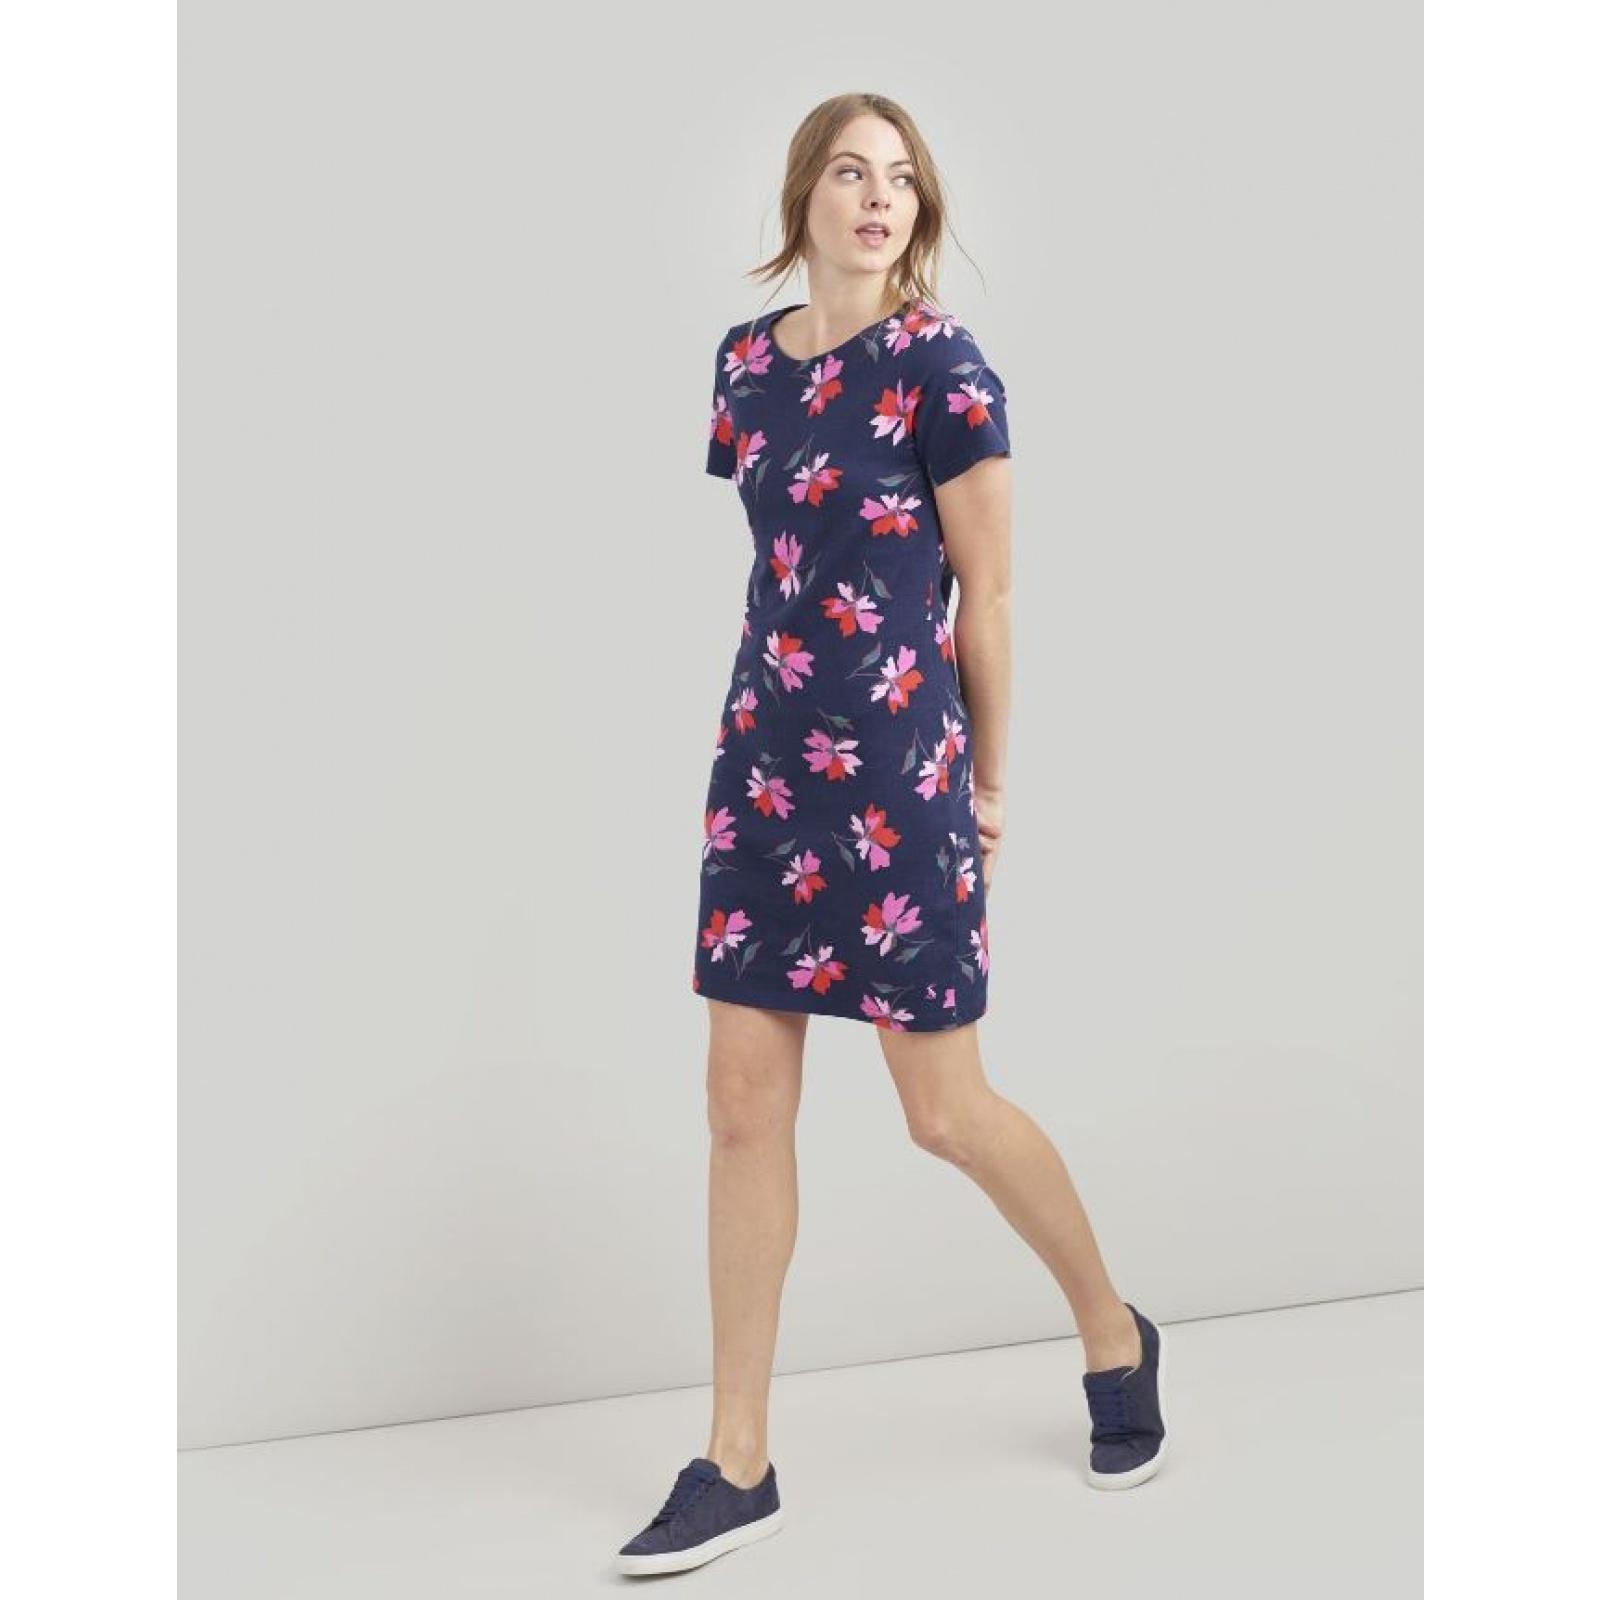 Joules-Riviera-Print-T-Shirt-Dress-with-Short-Sleeves-SS19 thumbnail 20